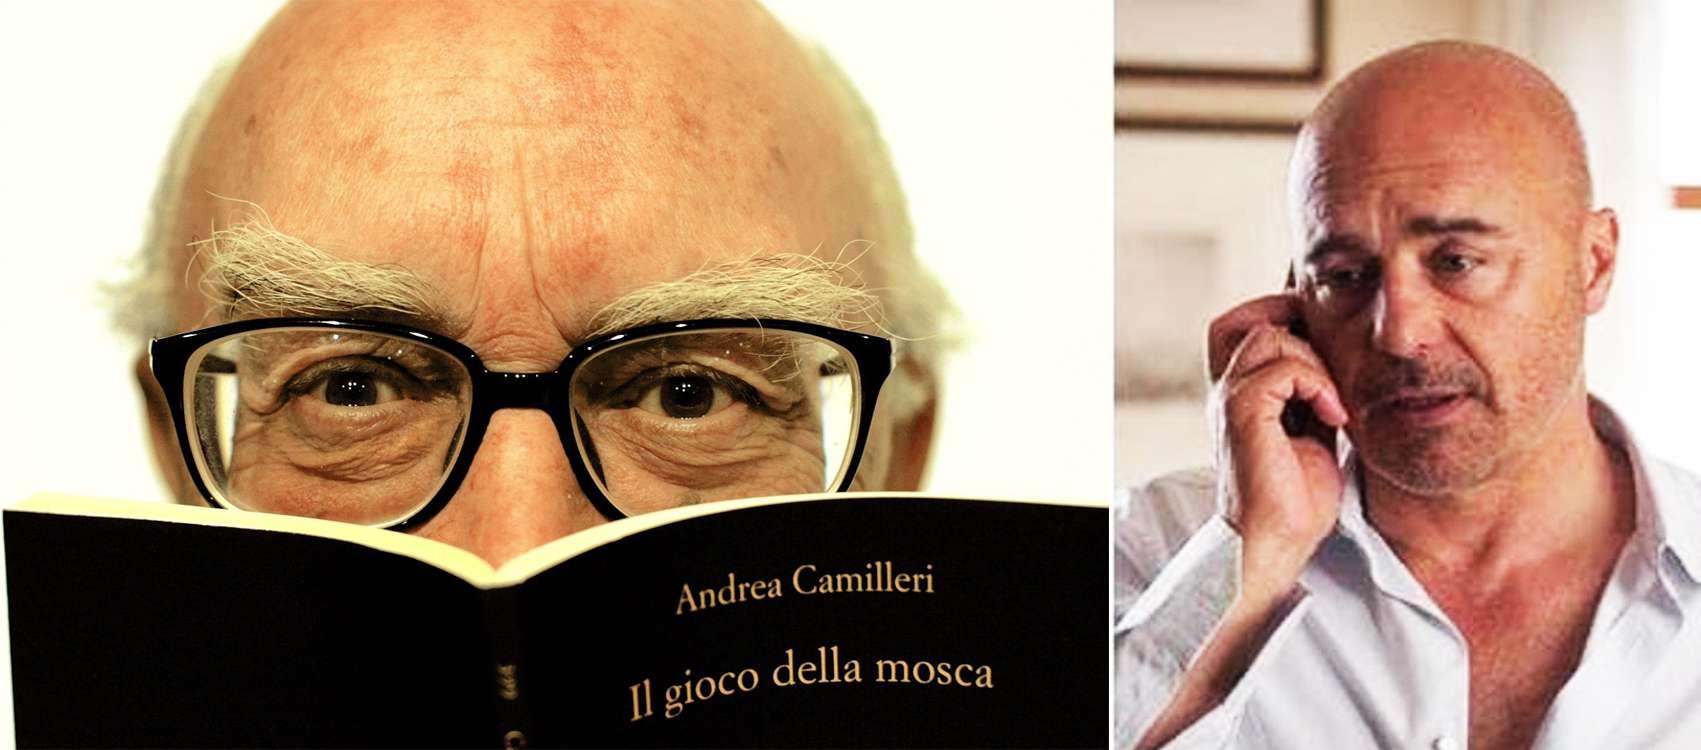 Andrea Camilleri η προσωποποίηση της αναζήτησης και της αμφιβολίας